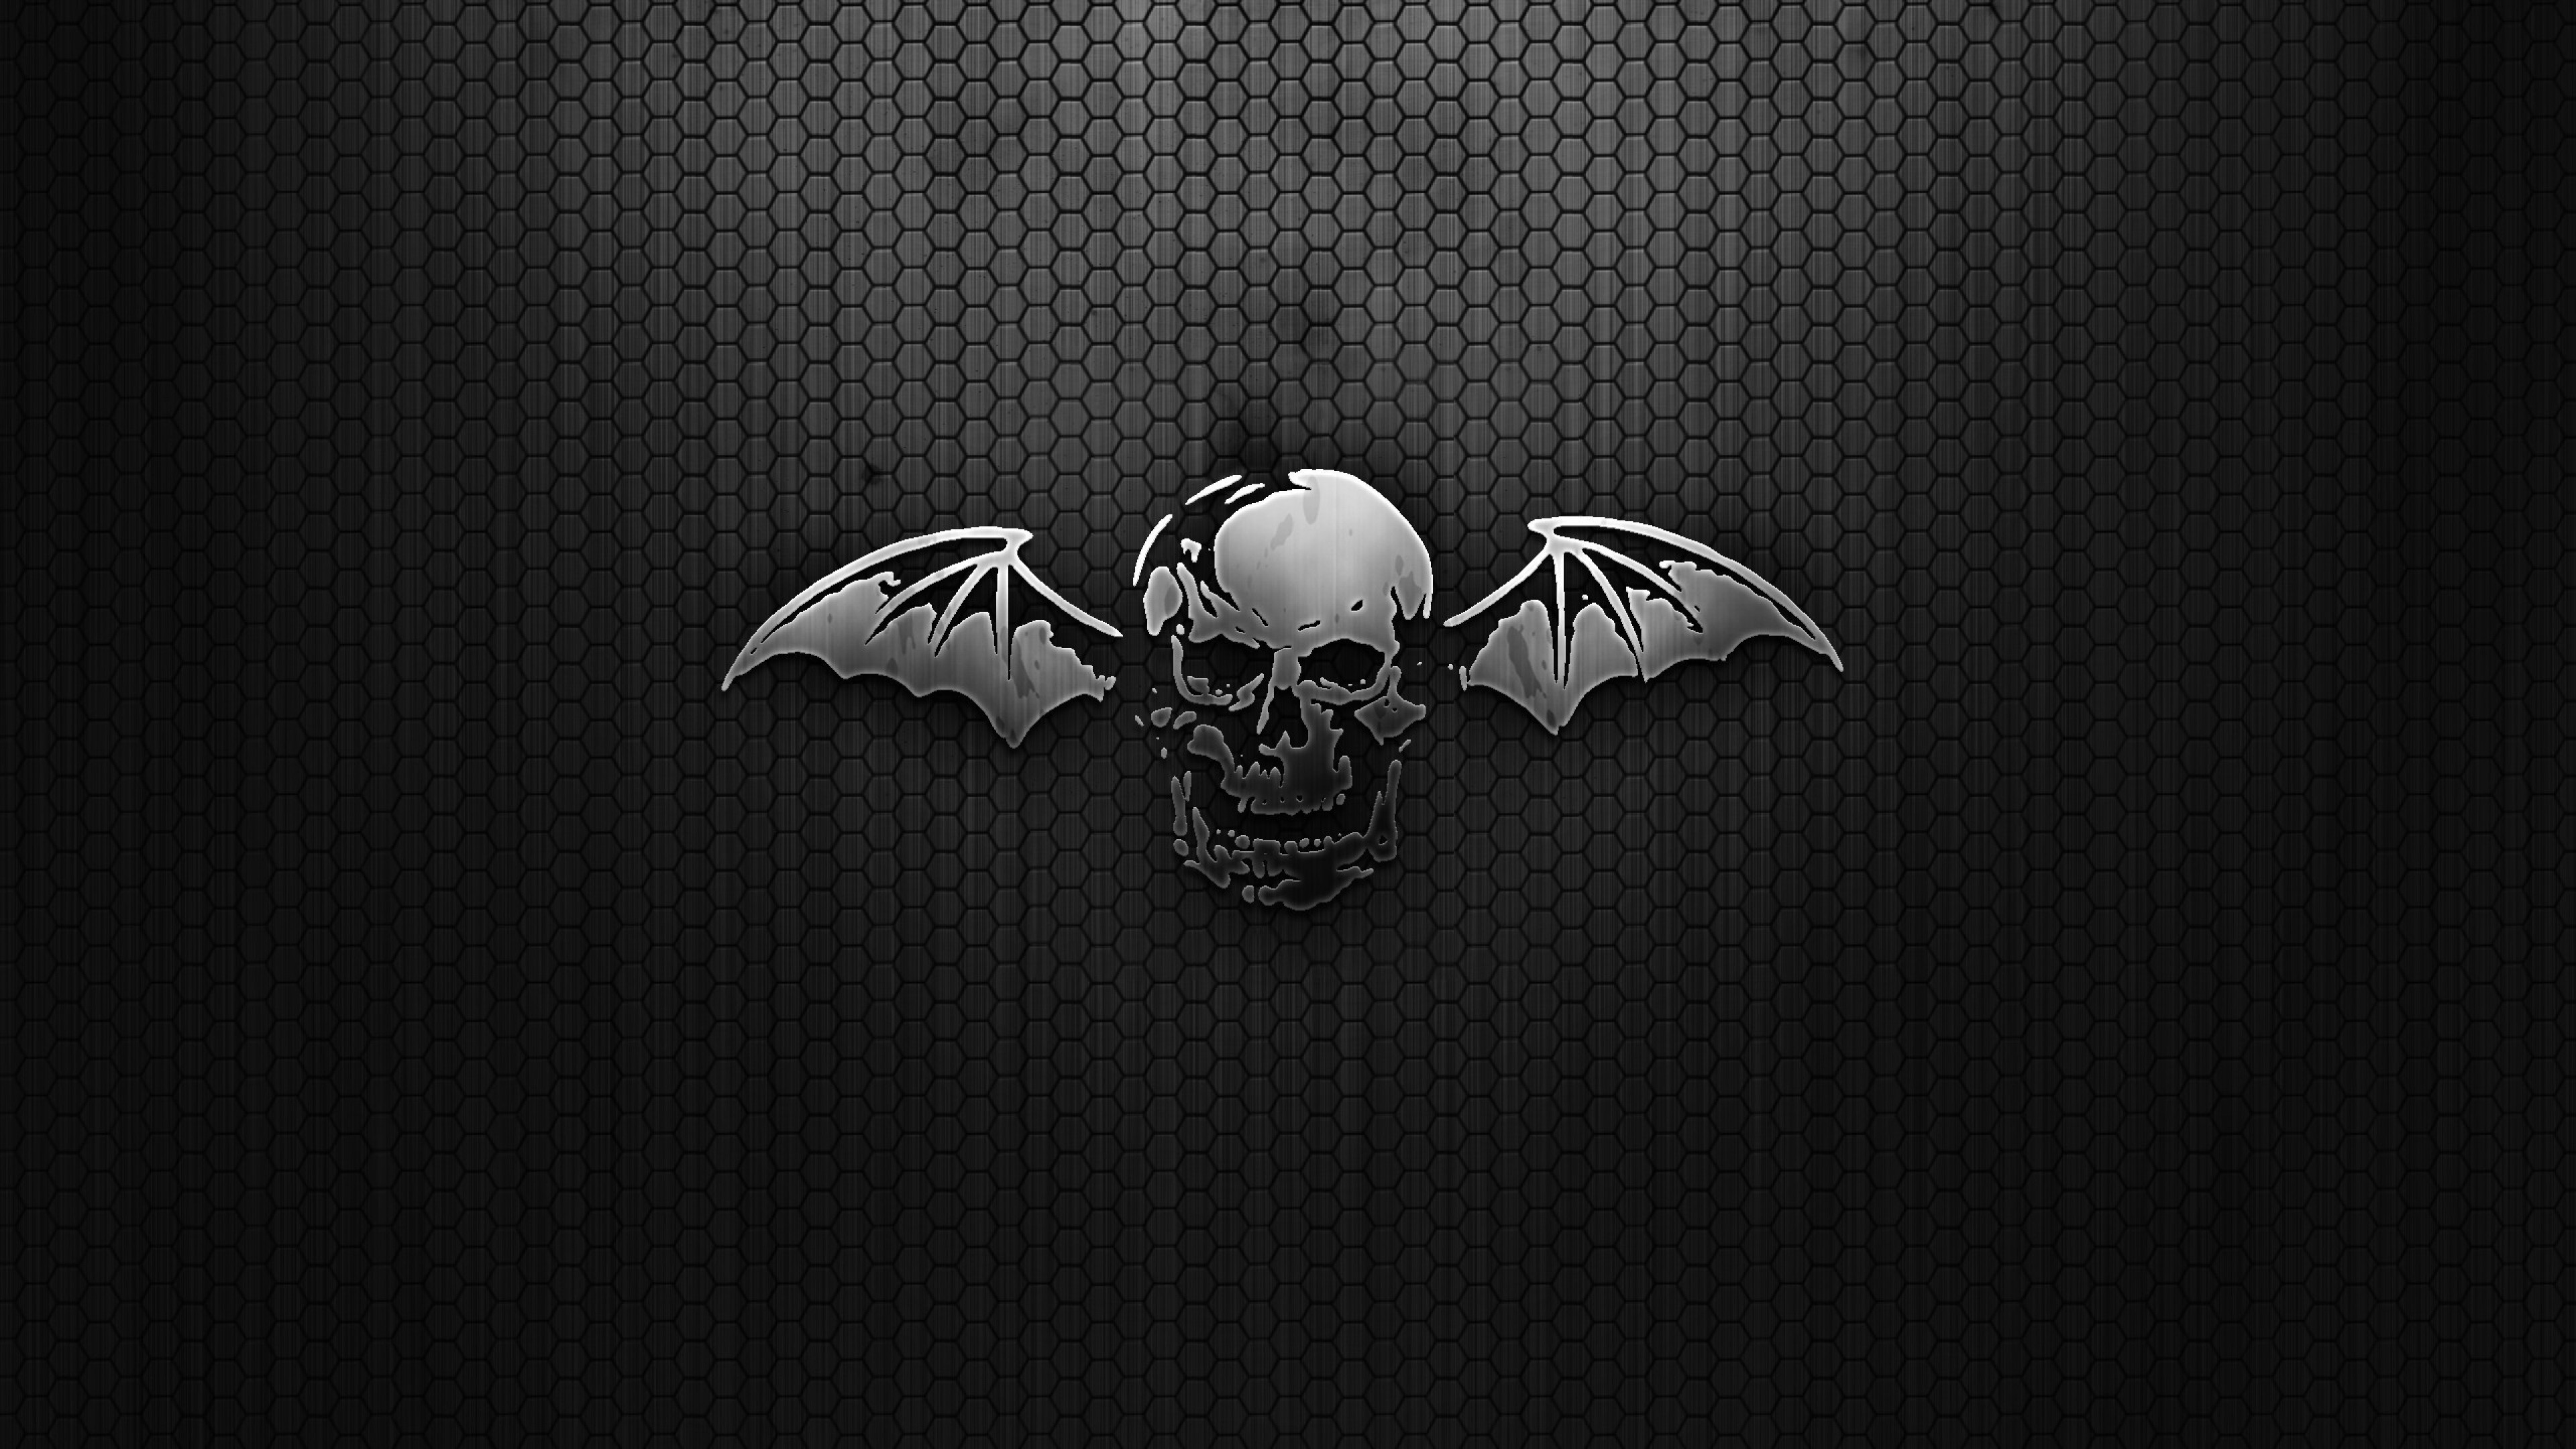 Wallpaper black, skull, wings, mesh